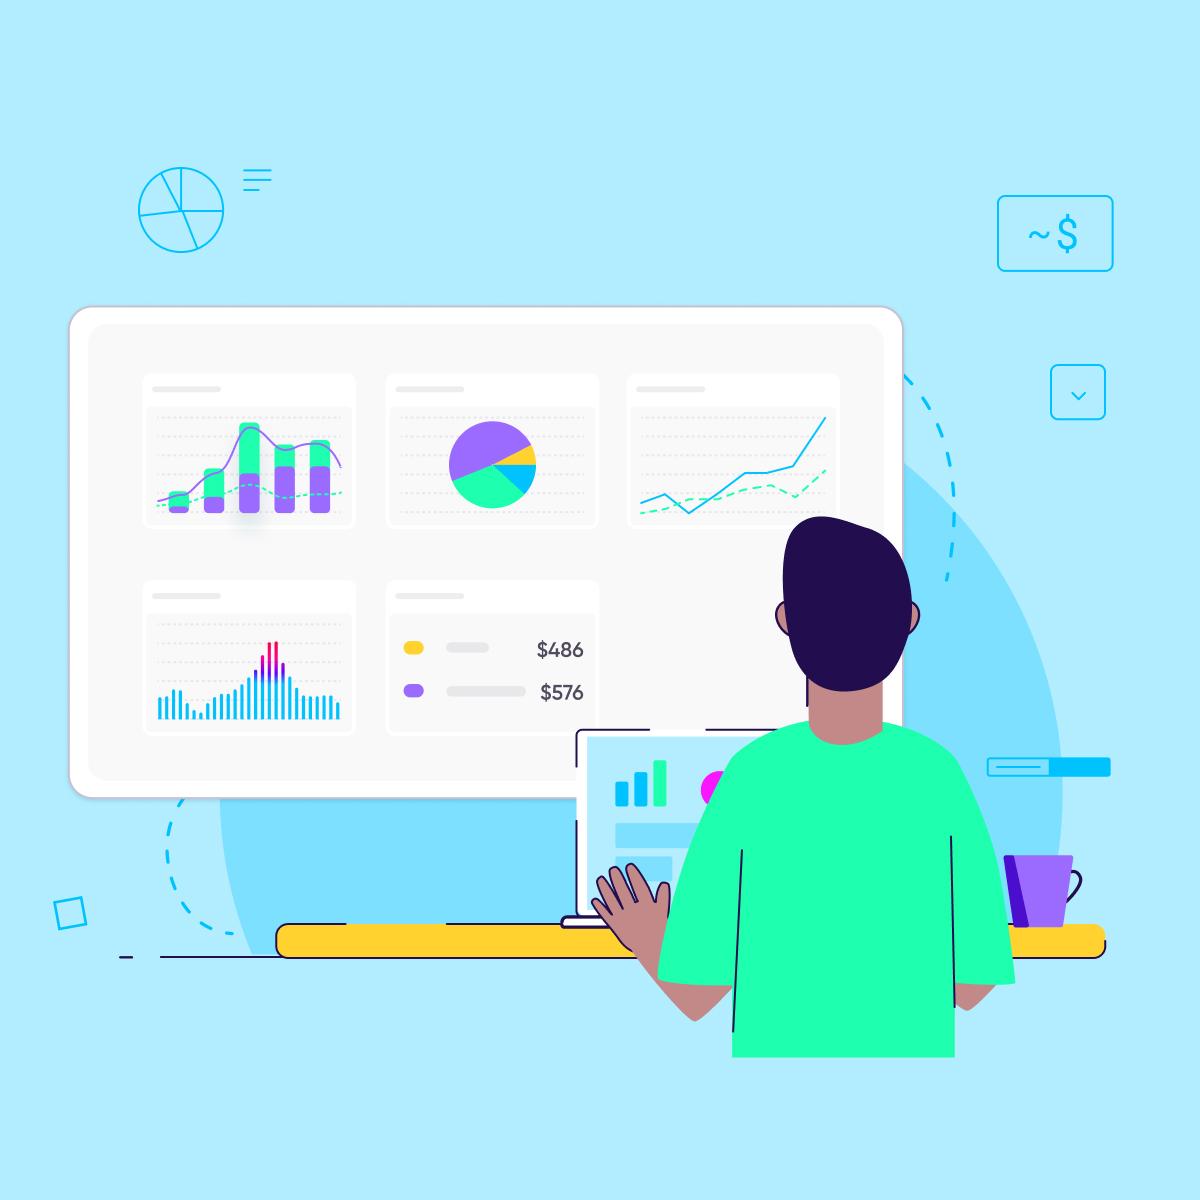 app campaigns marketing analytics - Square